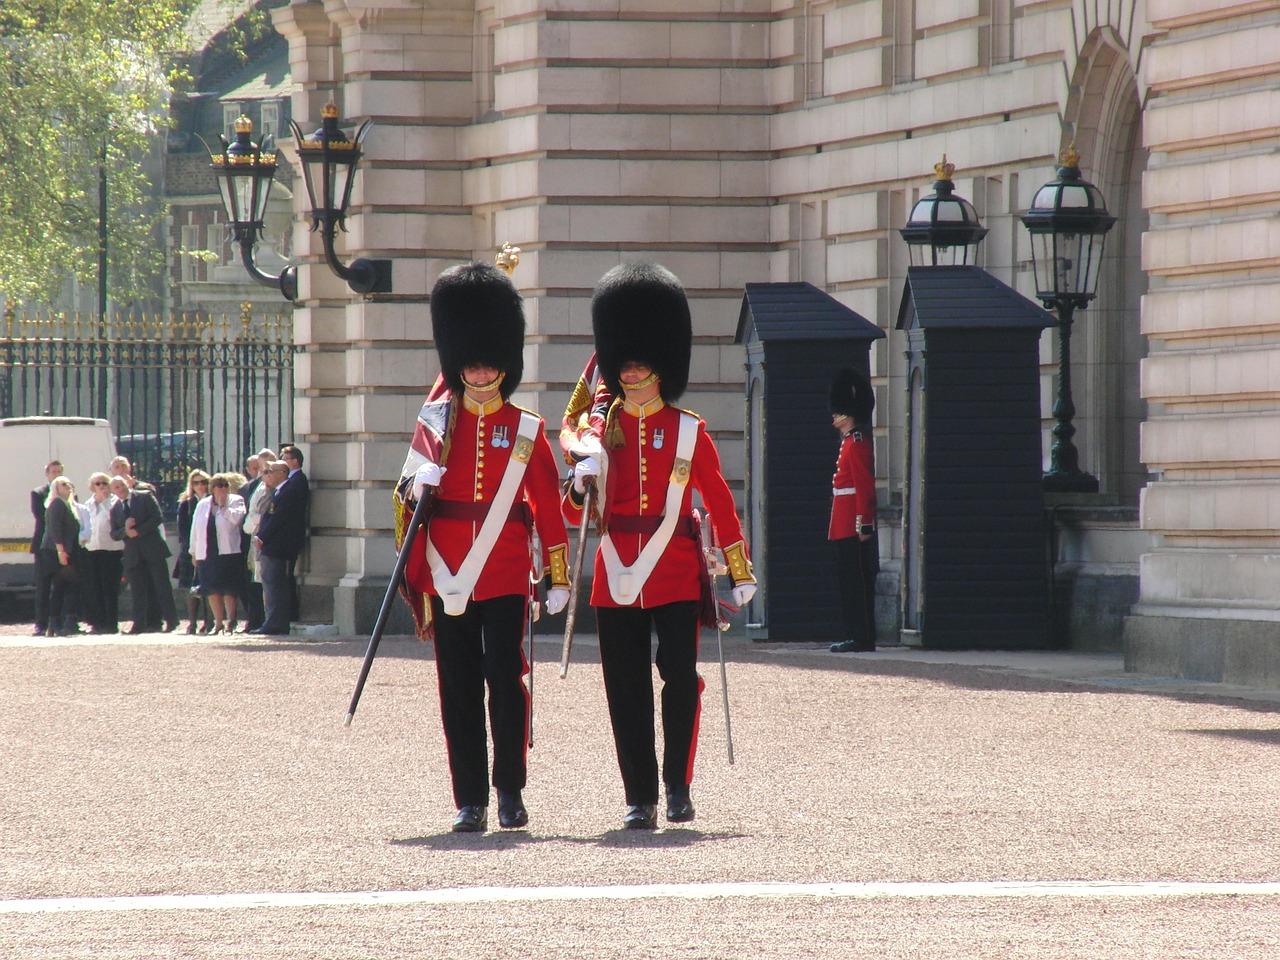 garde buckingham palace